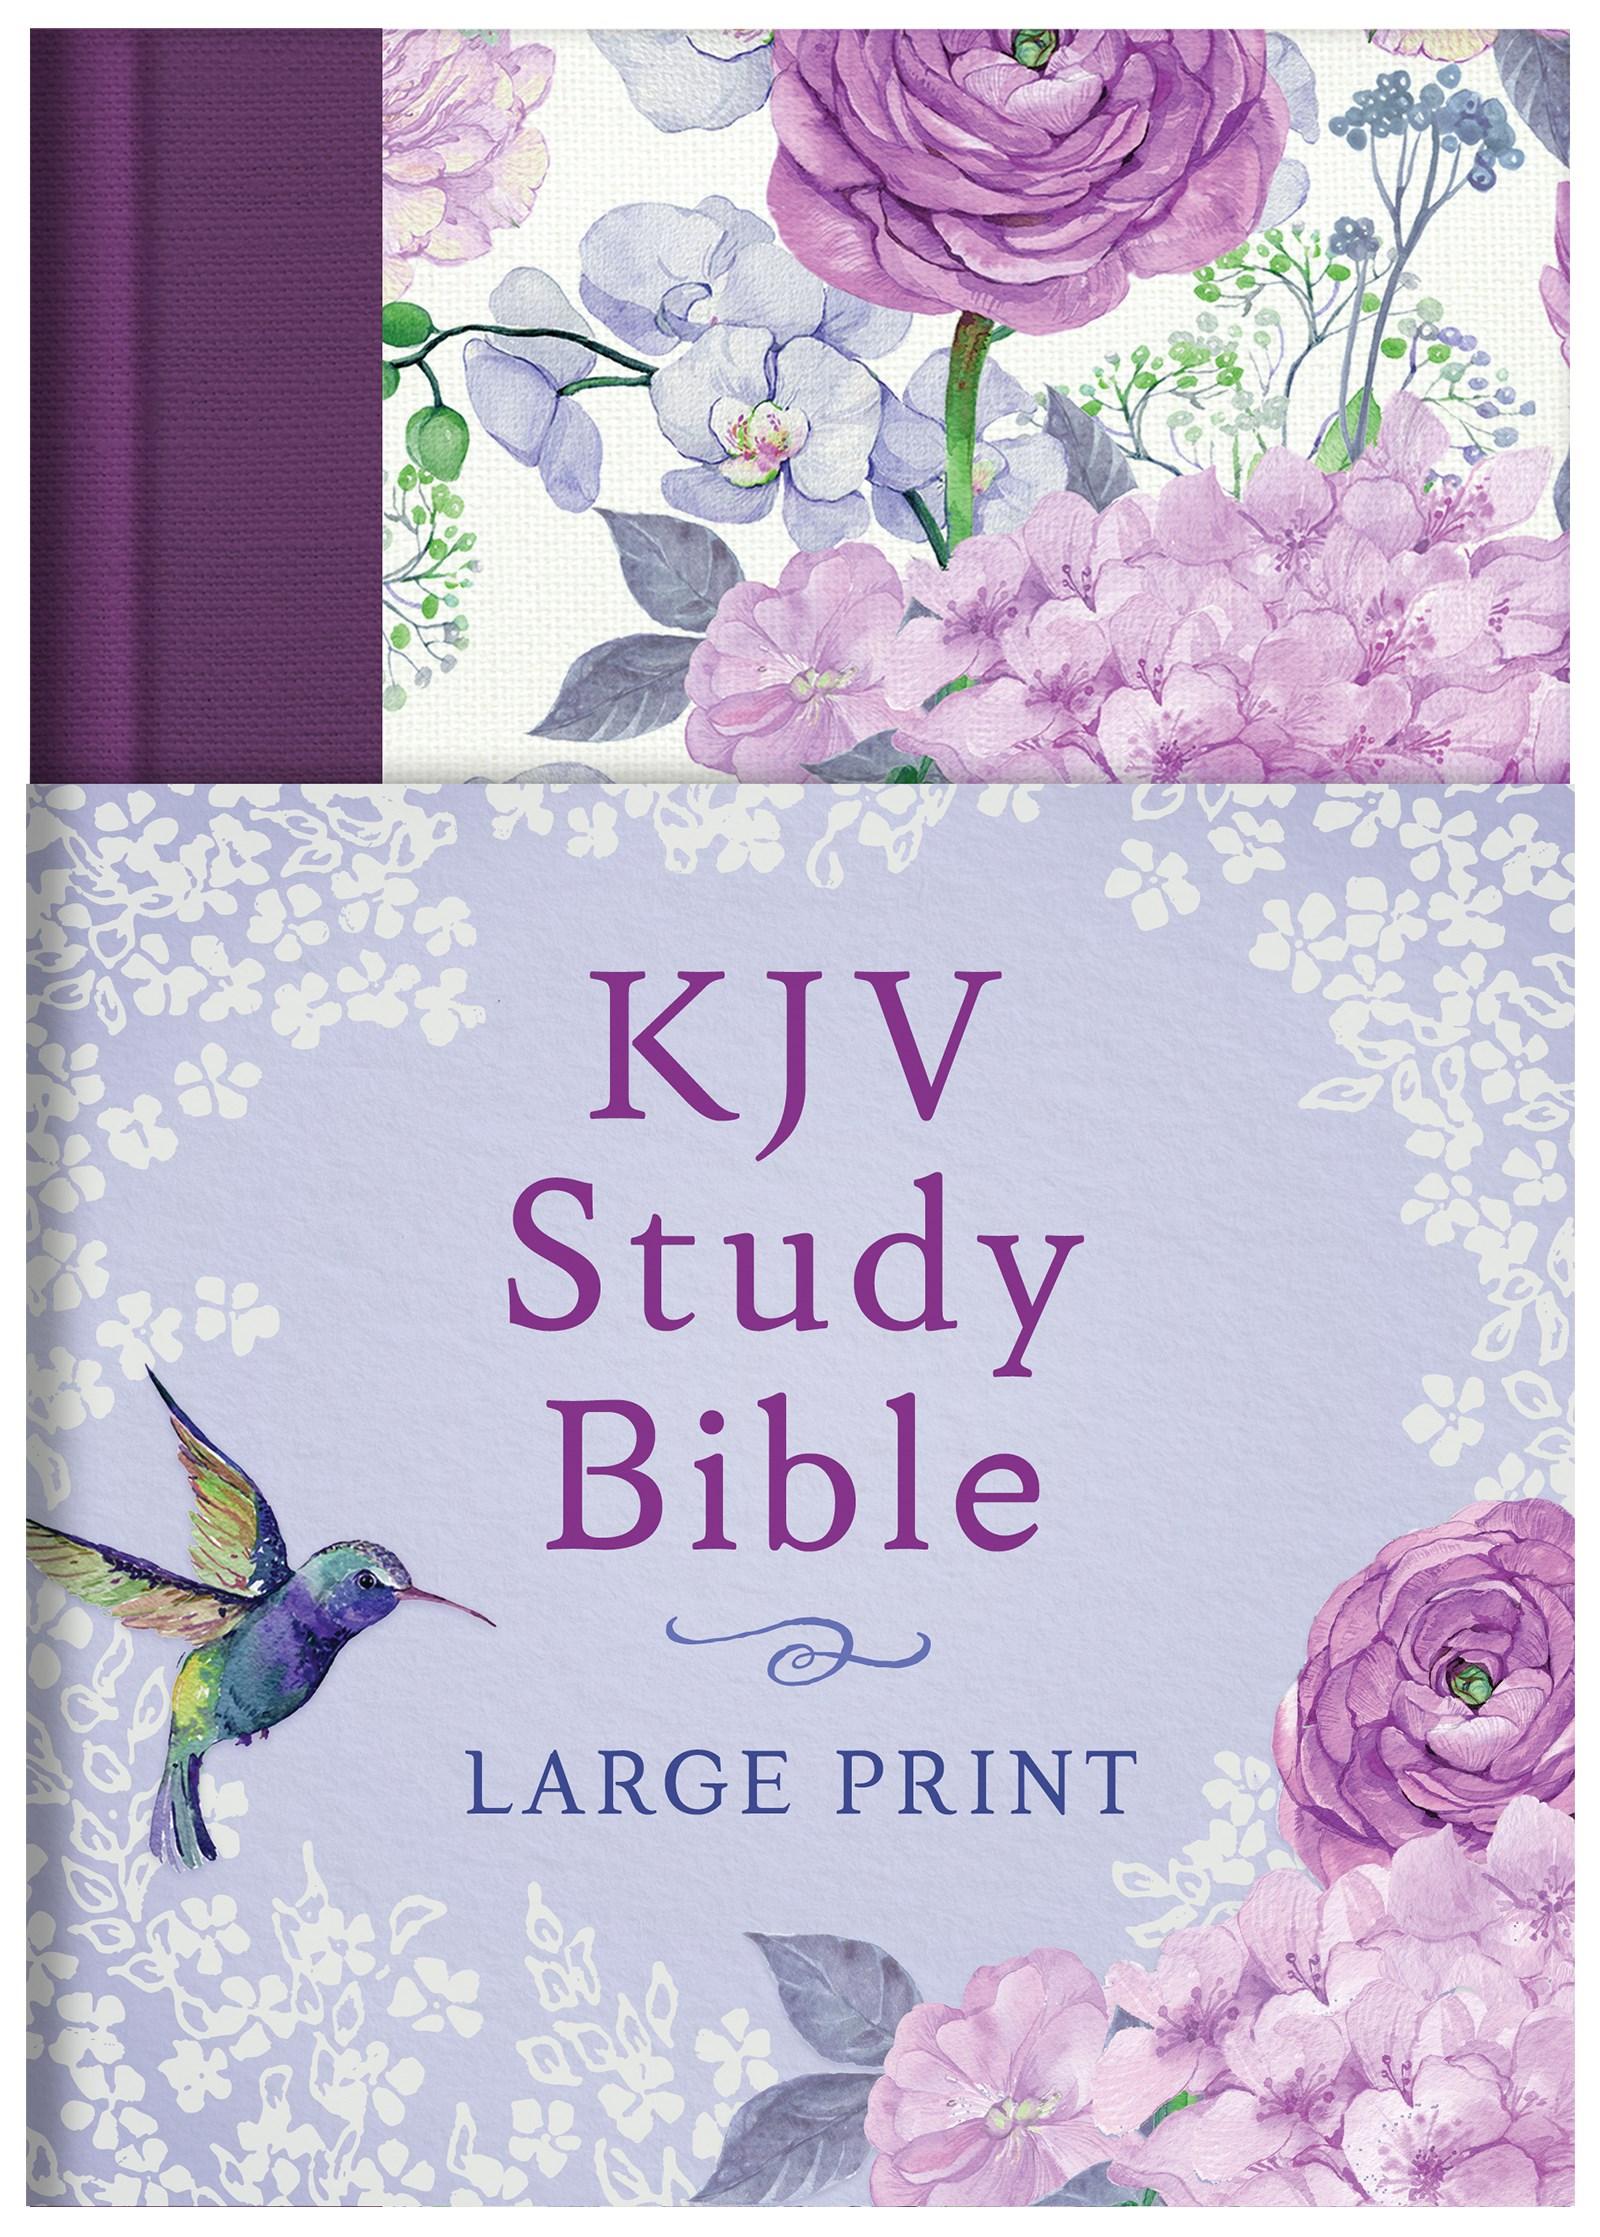 KJV Study Bible/Large Print-Hummingbird Lilacs Hardcover